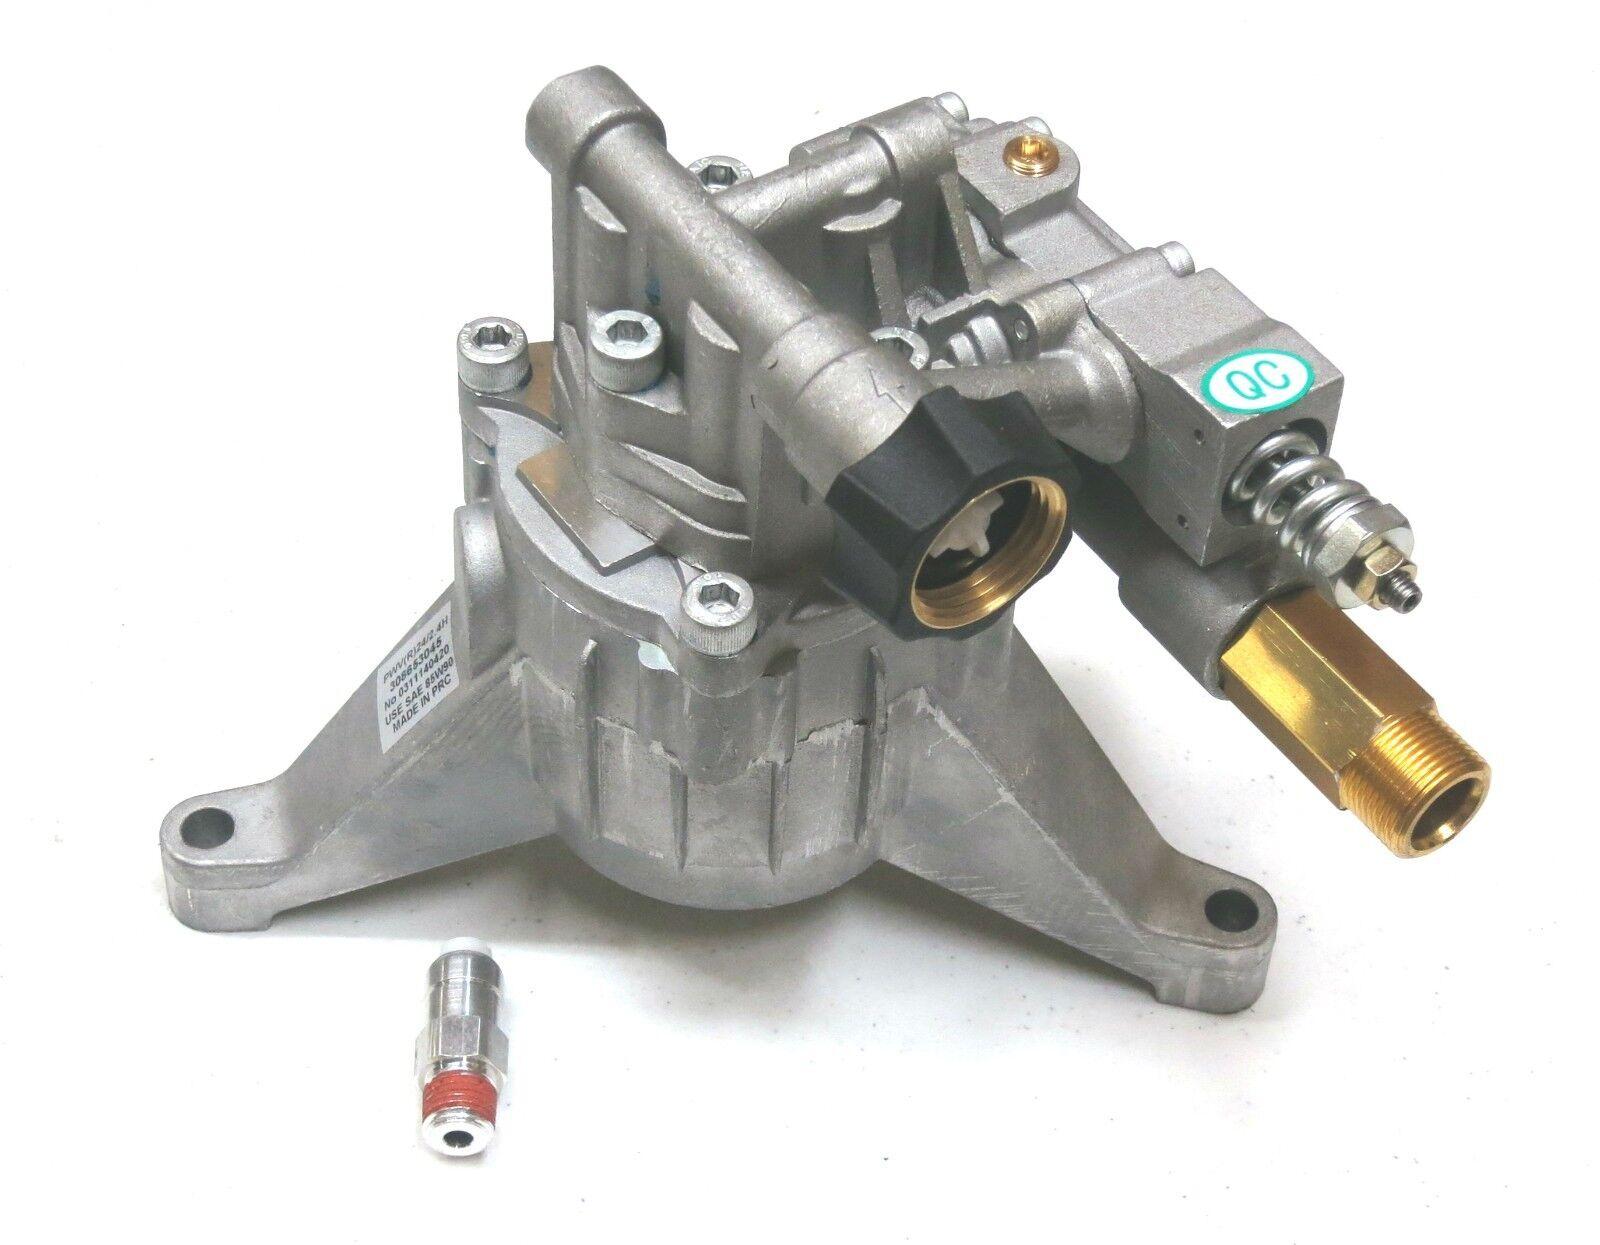 New 2700 PSI Pressure Washer Water Pump Sears 580.768340 580.768341